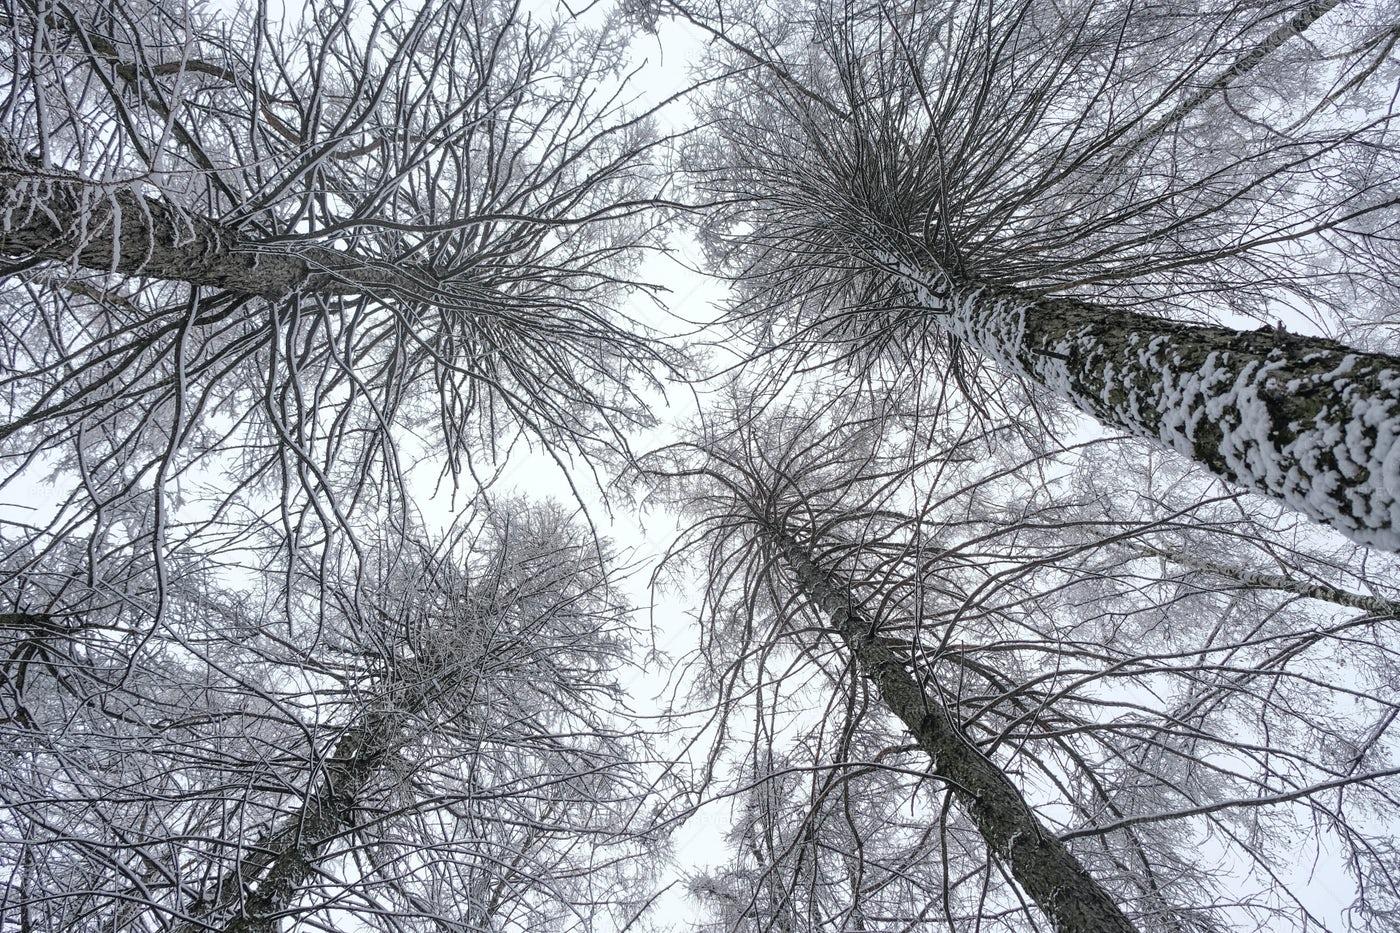 Winter Trees: Stock Photos